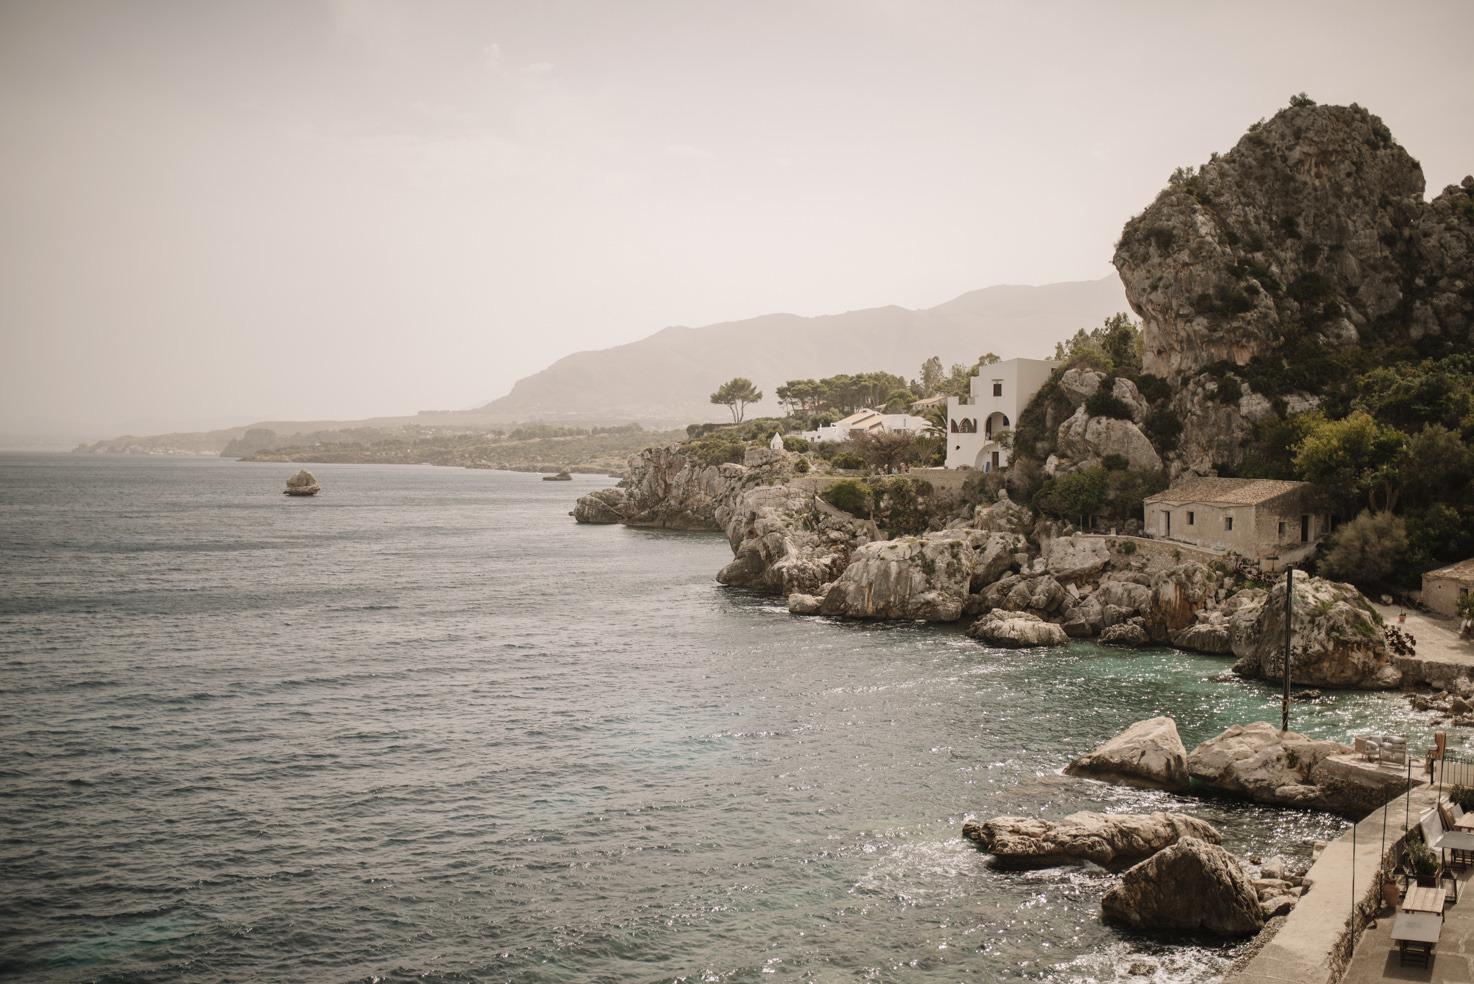 Panorama of Sicily